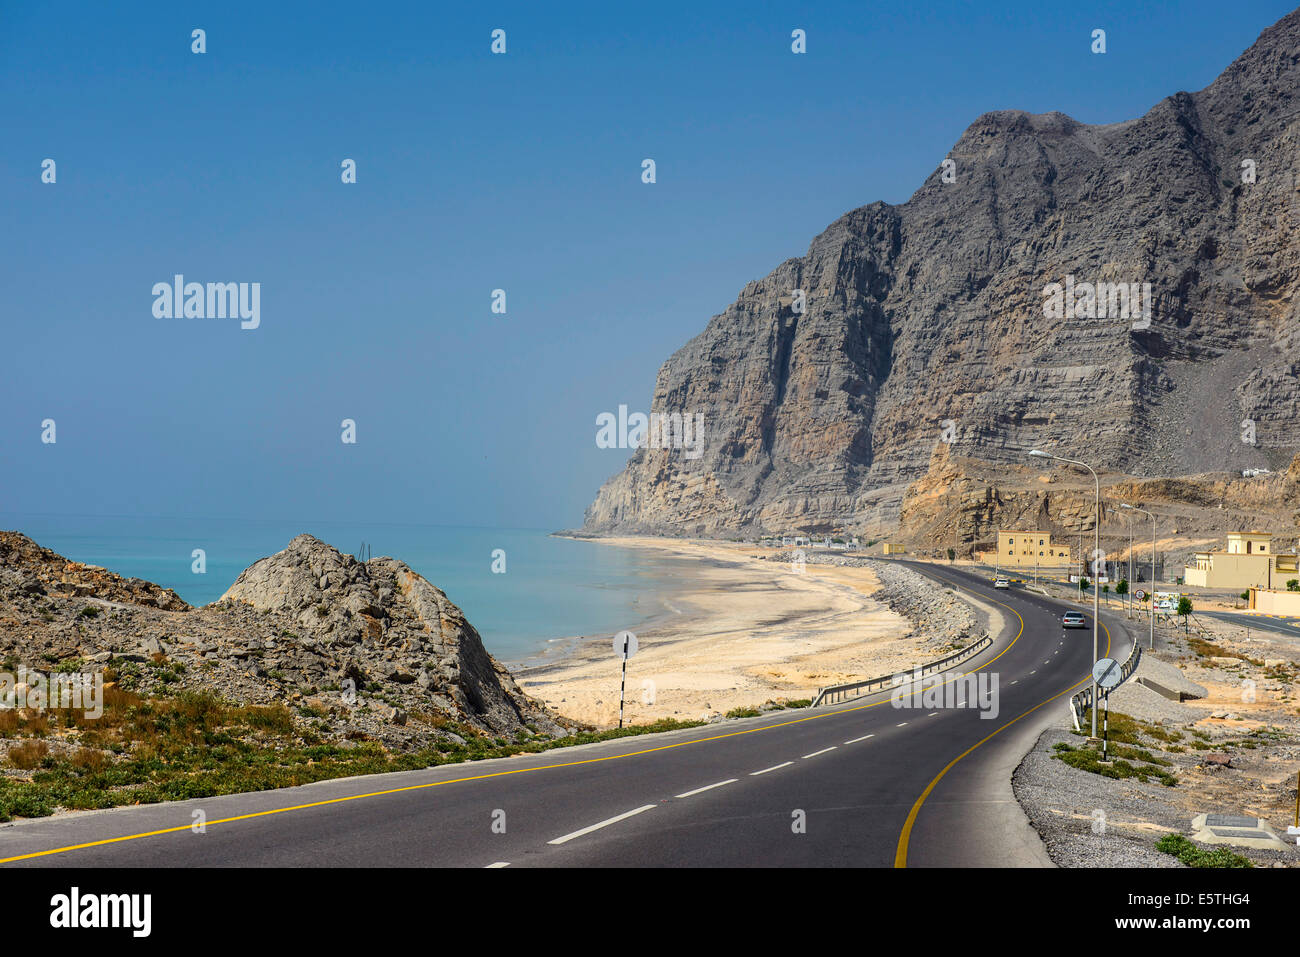 Khasab strada costiera, Musandam, Oman, Medio Oriente Immagini Stock